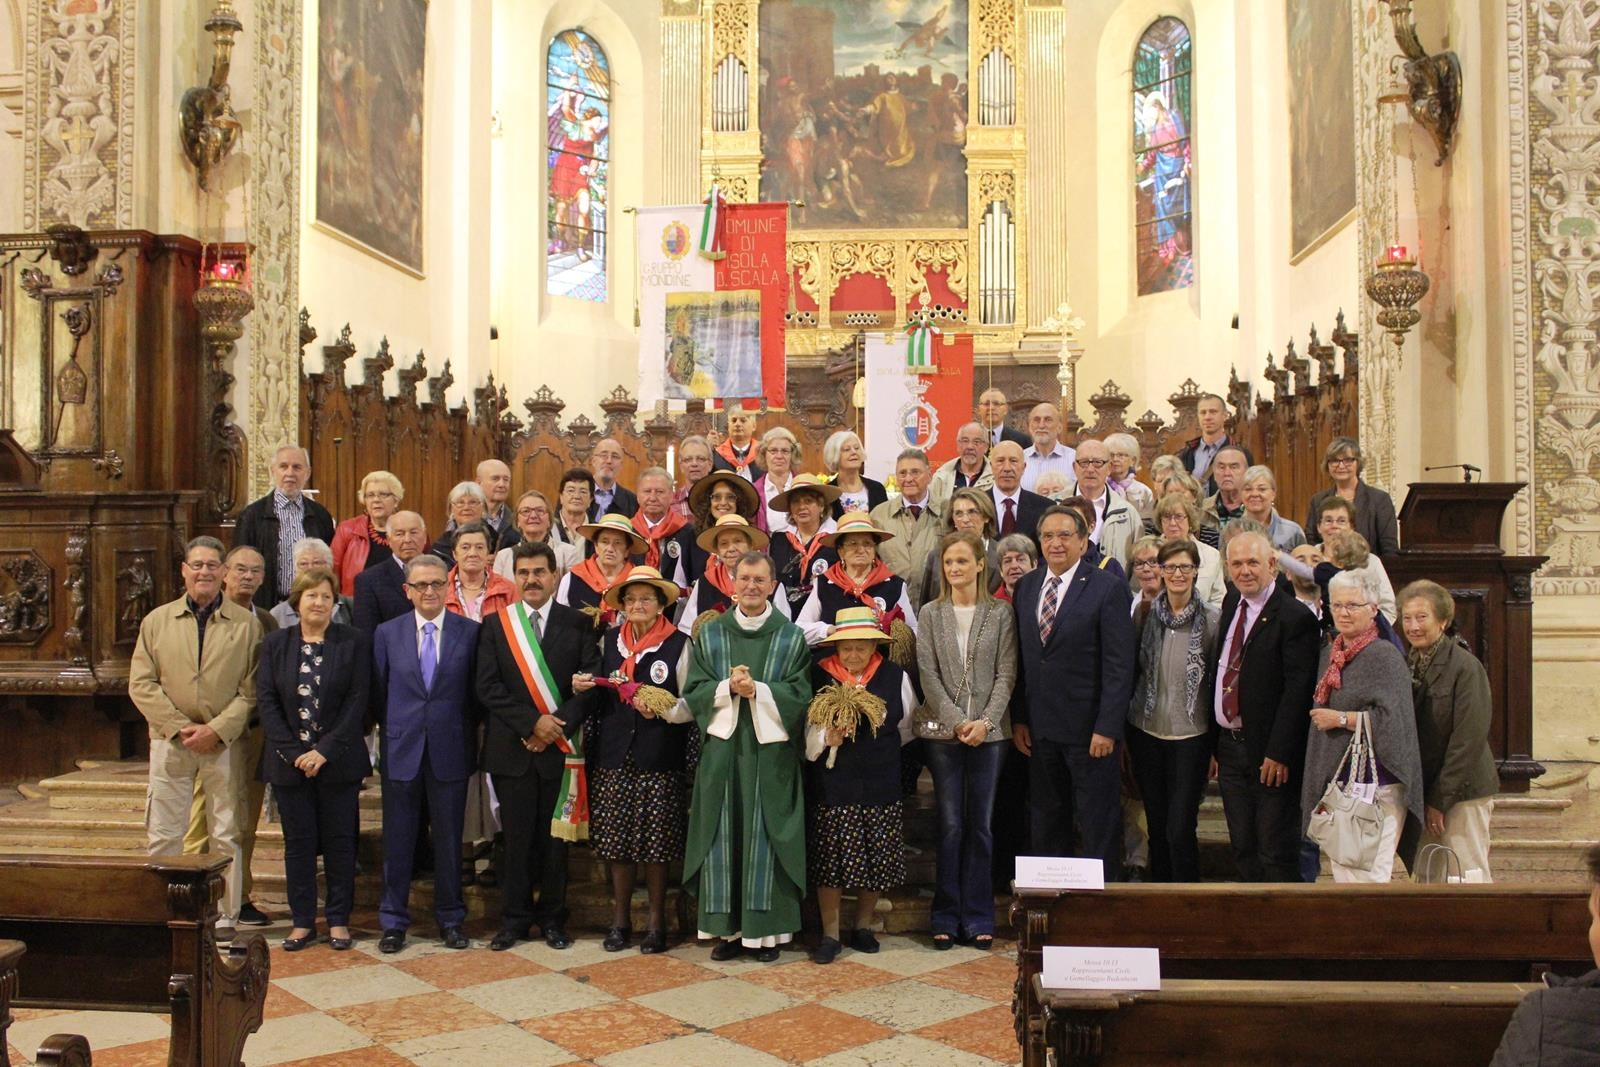 Reisfest in Isola della Scala 2015 (12)